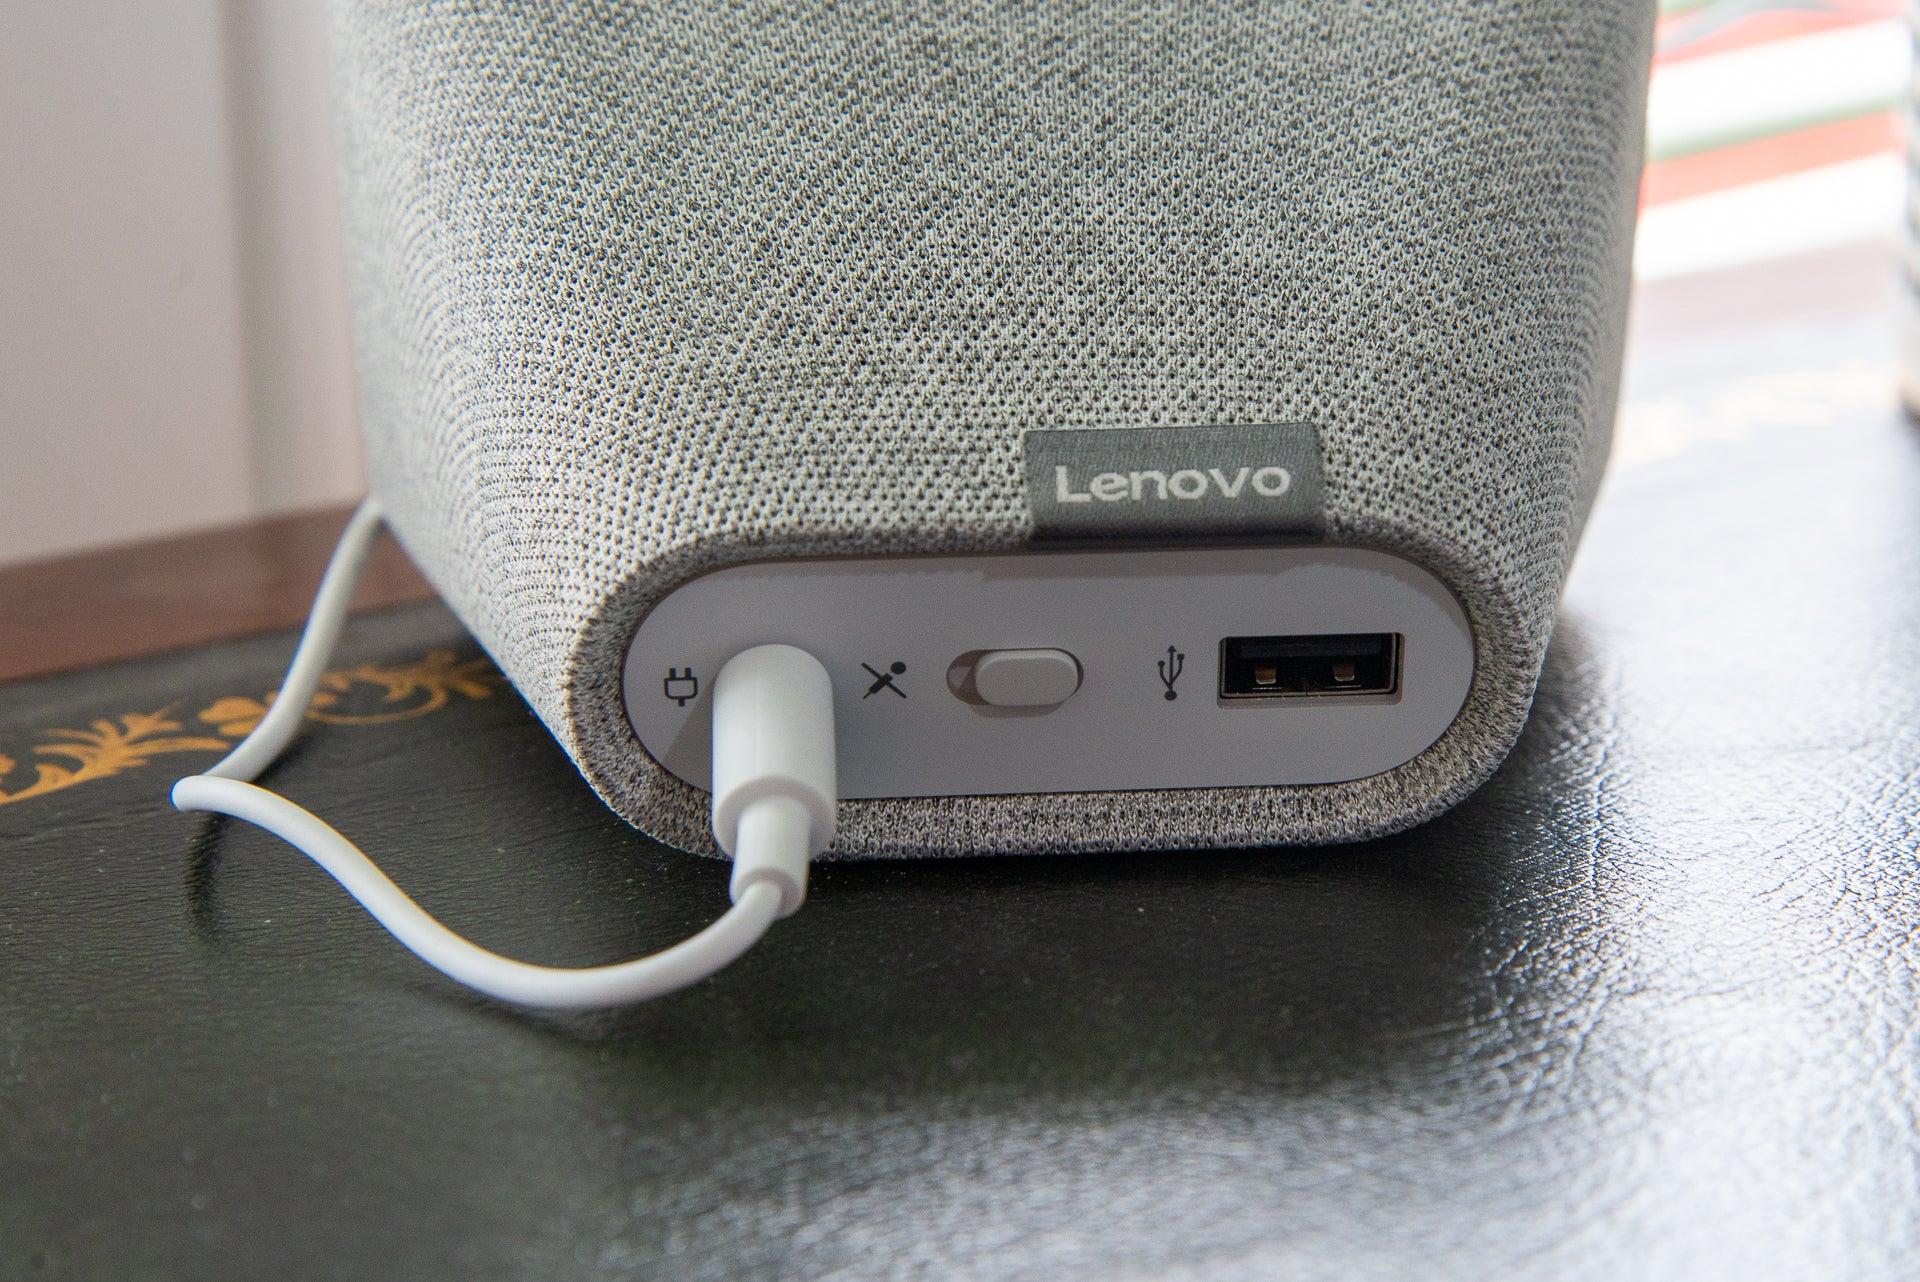 Lenovo Smart Clock rear